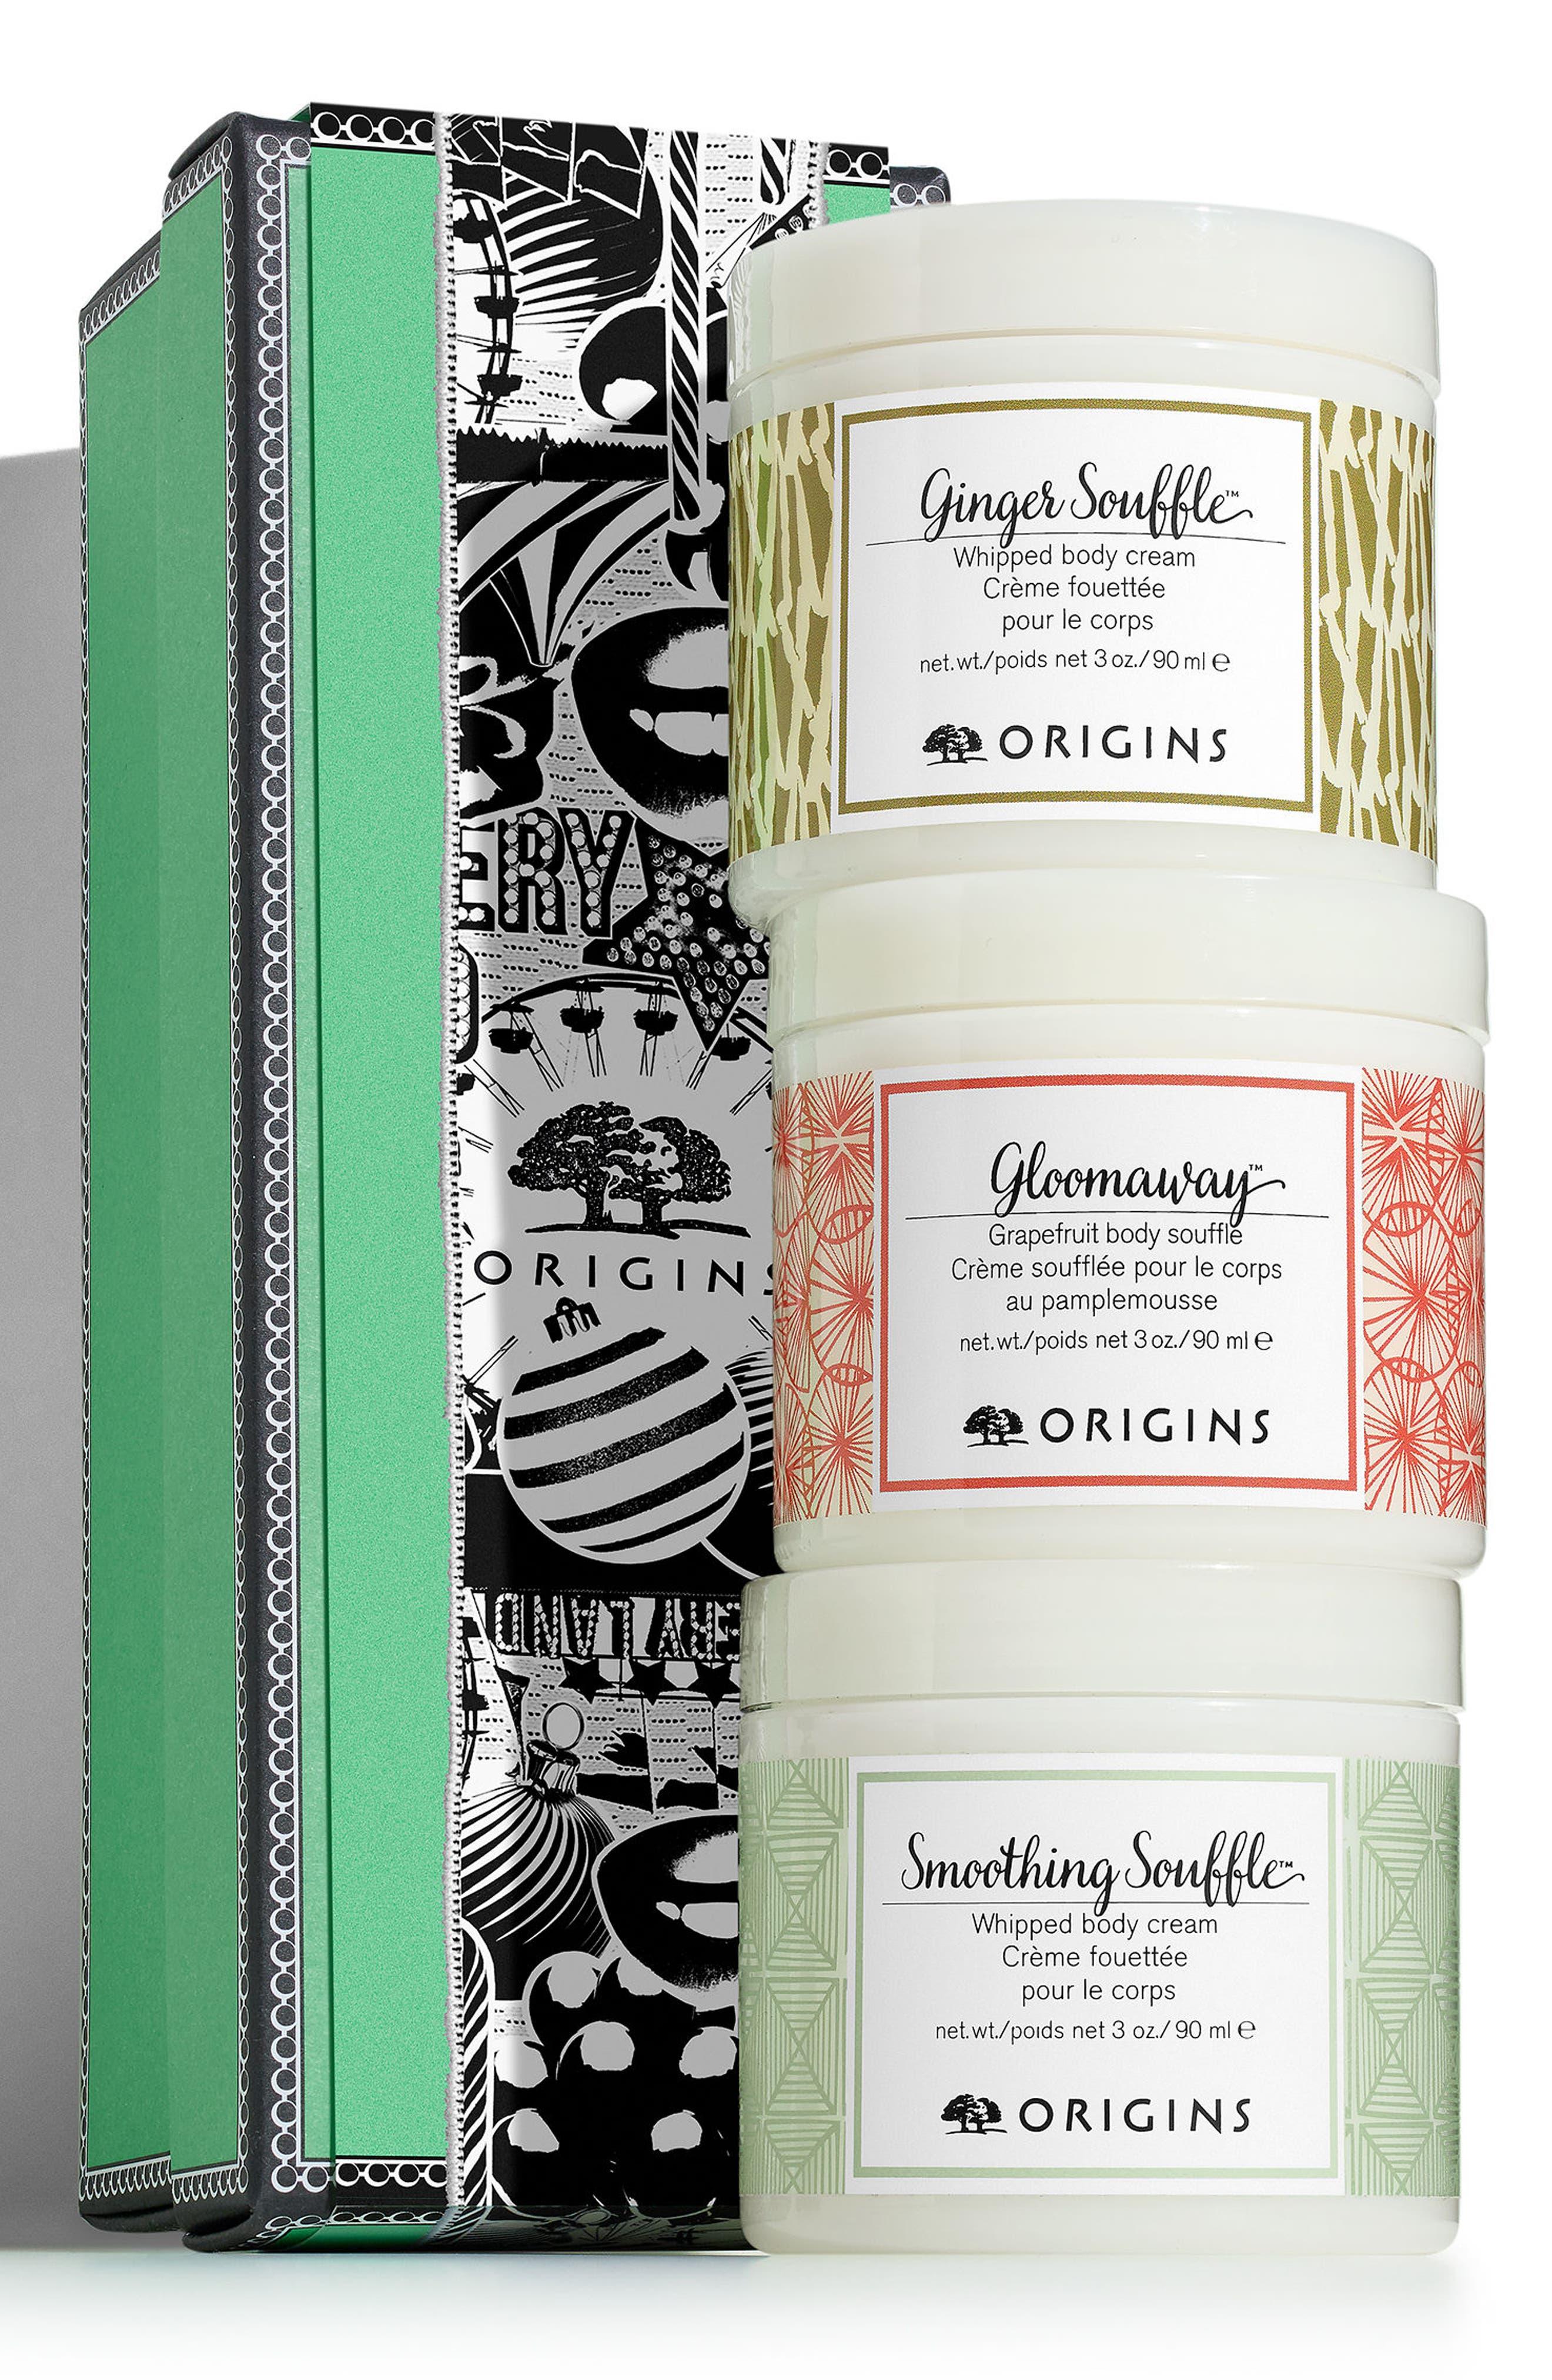 Origins Mini Soufflé Sampler Collection ($47 Value)